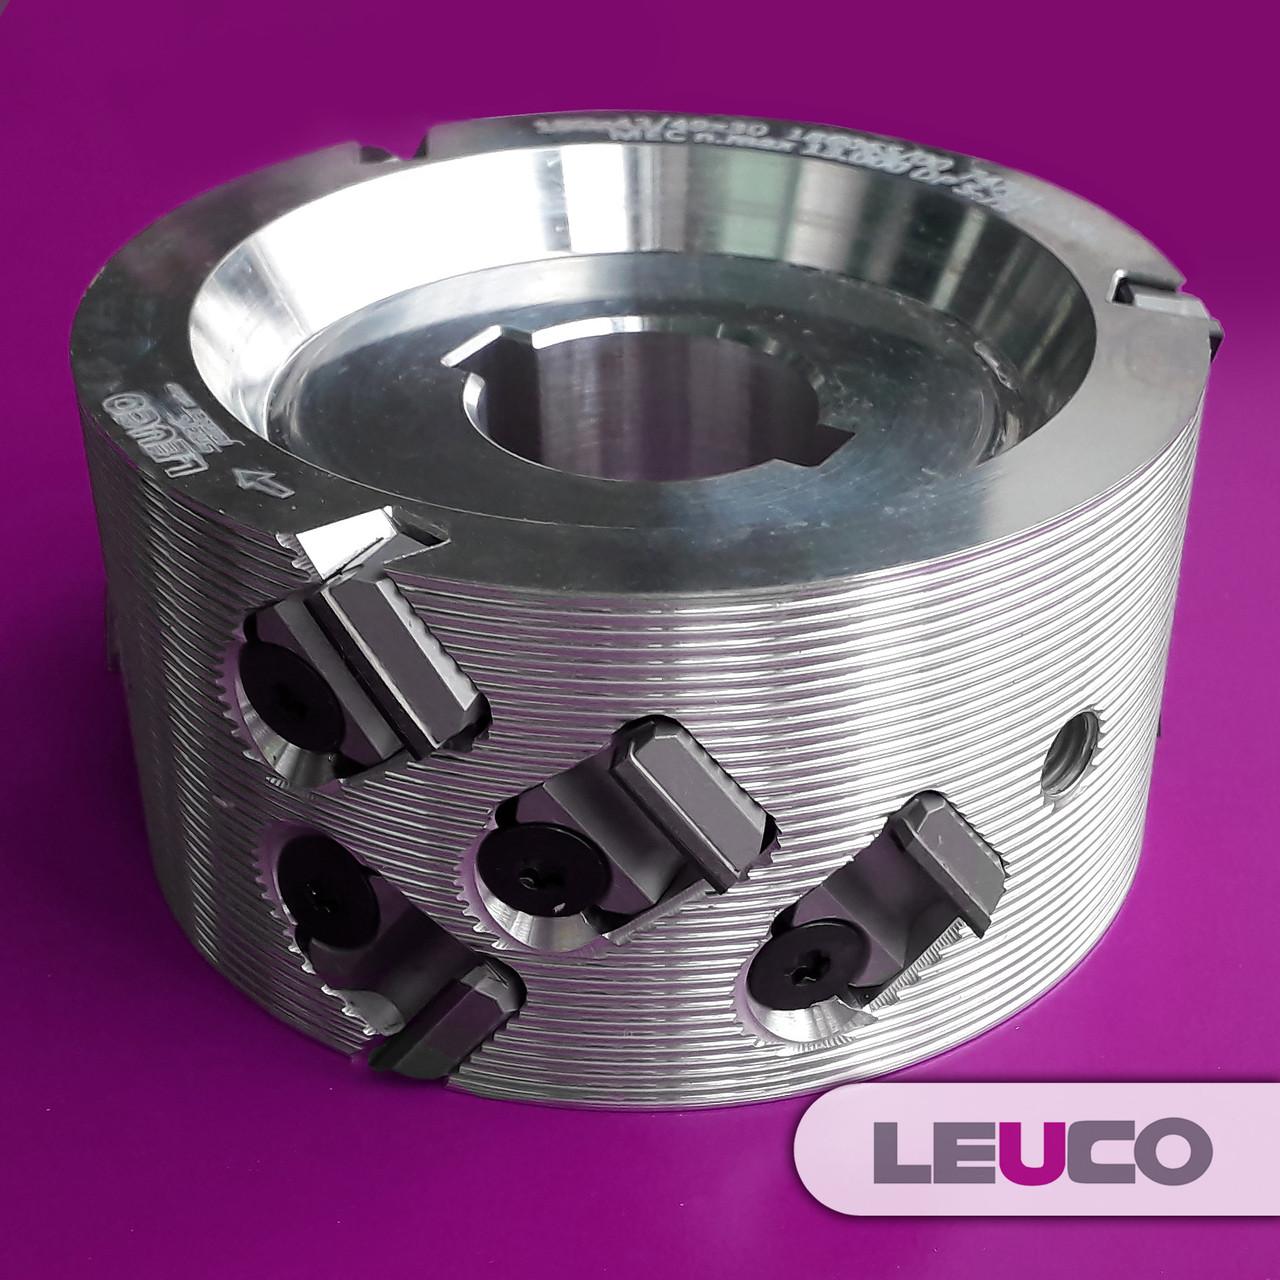 Алмазная фреза для прифуговки под кромку LEUCO DIAMAX SmartJointer airFace DP